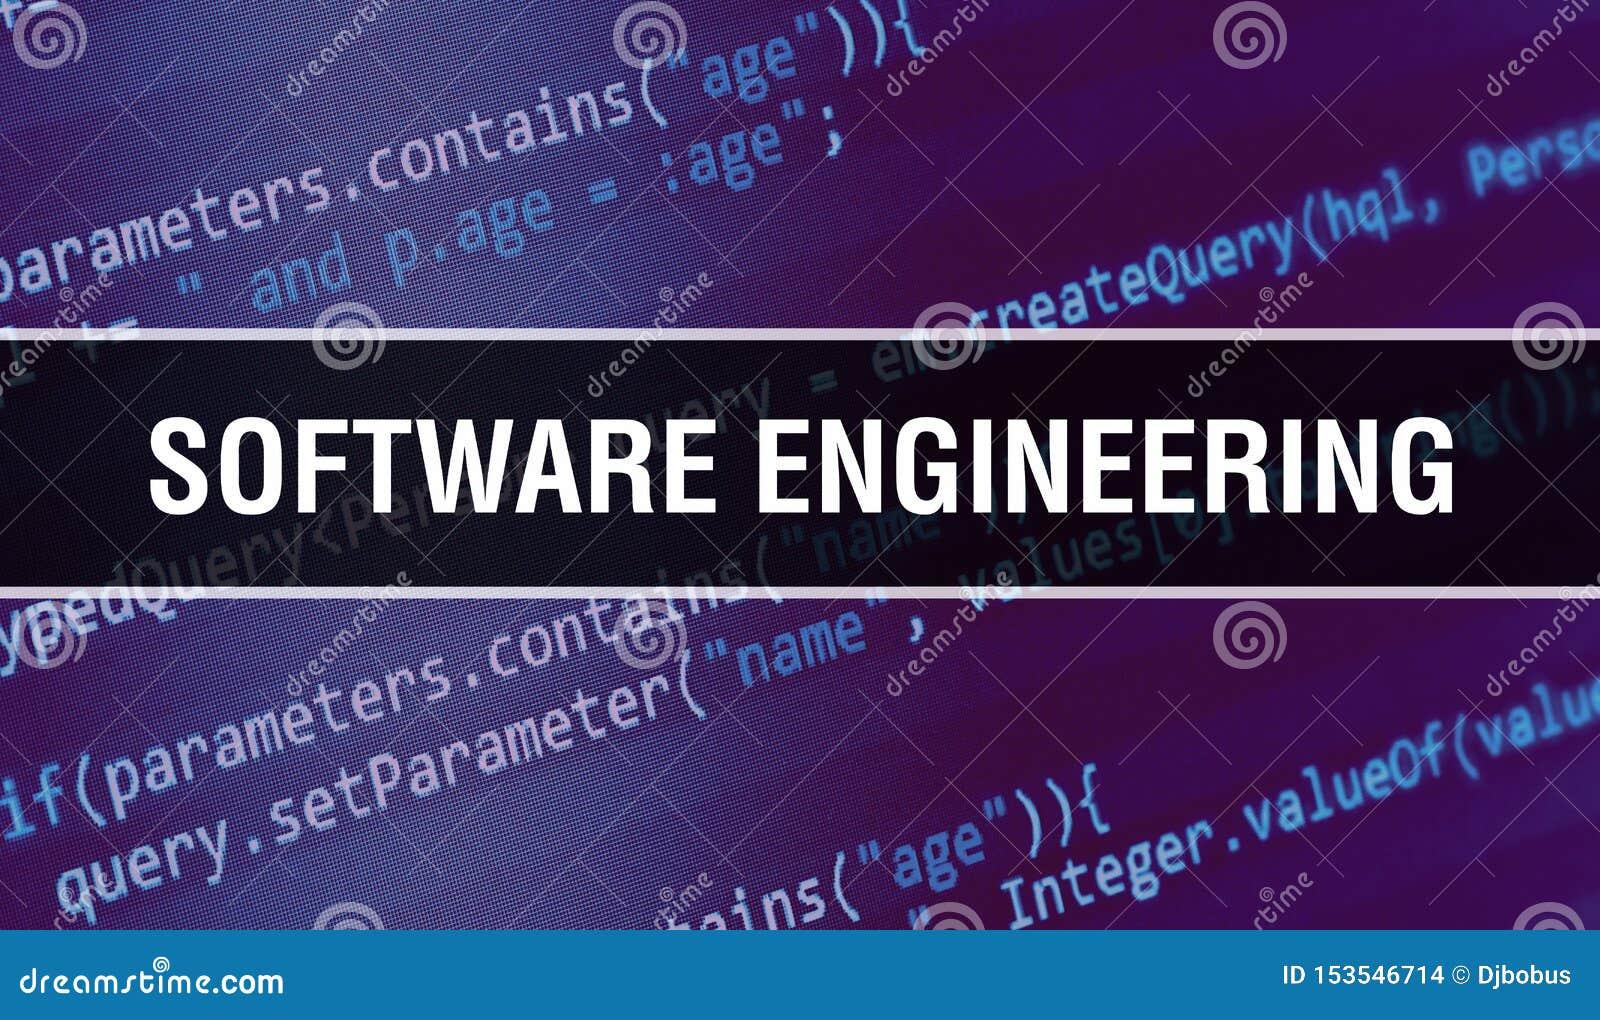 Software Engineering With Digital Java Code Text Software Engineering And Computer Software Coding Vector Concept Programming Stock Illustration Illustration Of Digital Development 153546714